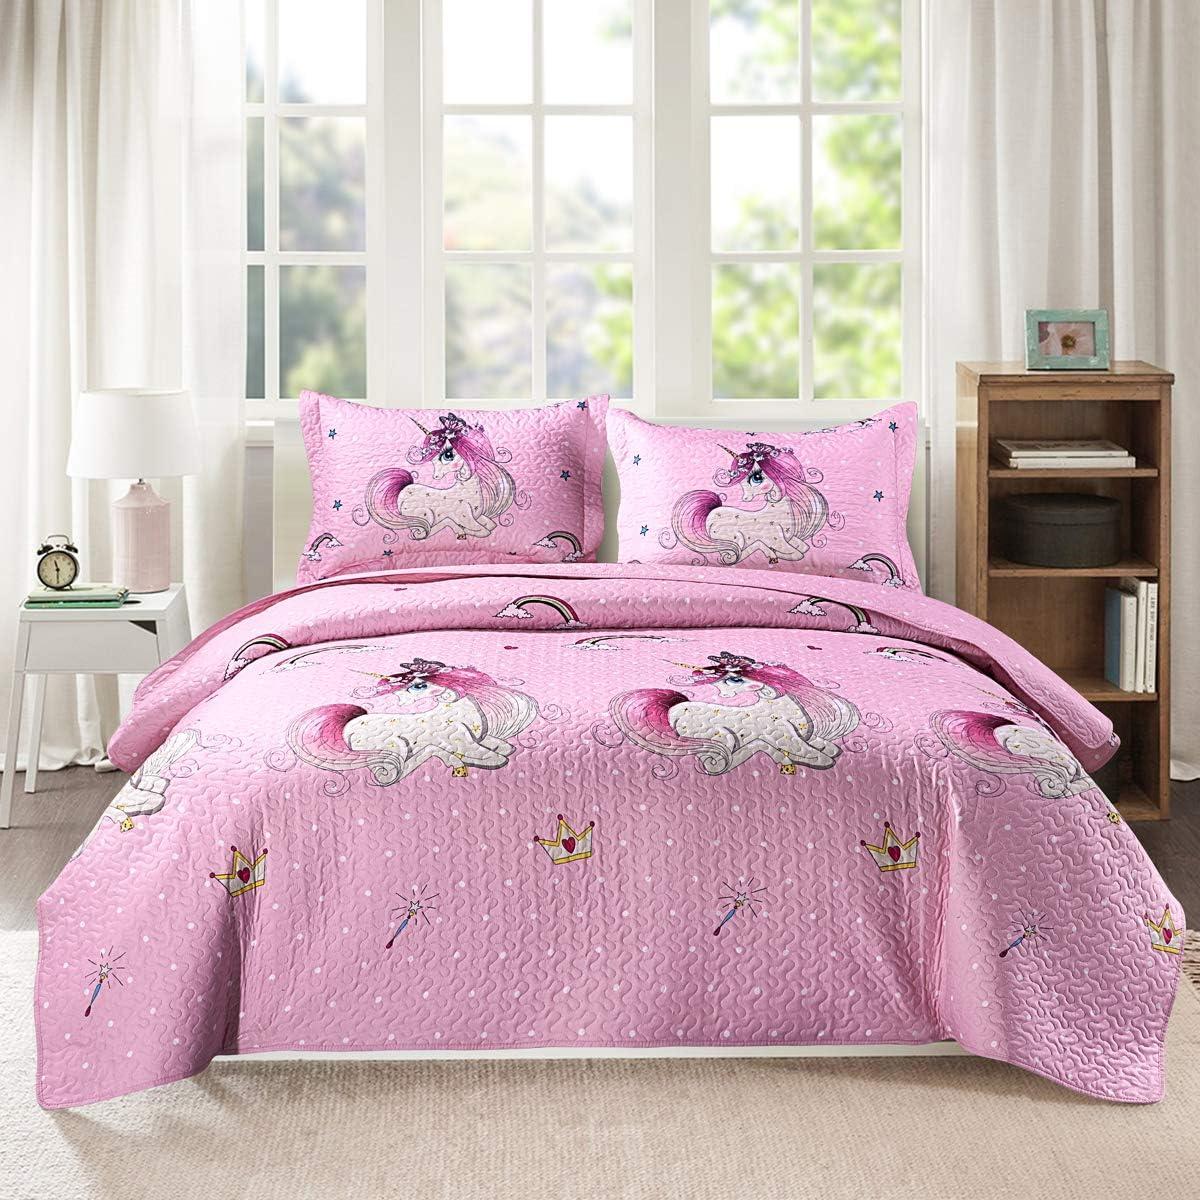 Kids Unicorn Quilt Set With Sham Full Queen Size Animal Cartoon Bedding Set Soft Reversible Bedspread Coverlet All Season Bed Set For Kids Teens Girls 1 Quilt 2 Pillowshams Pink Kitchen